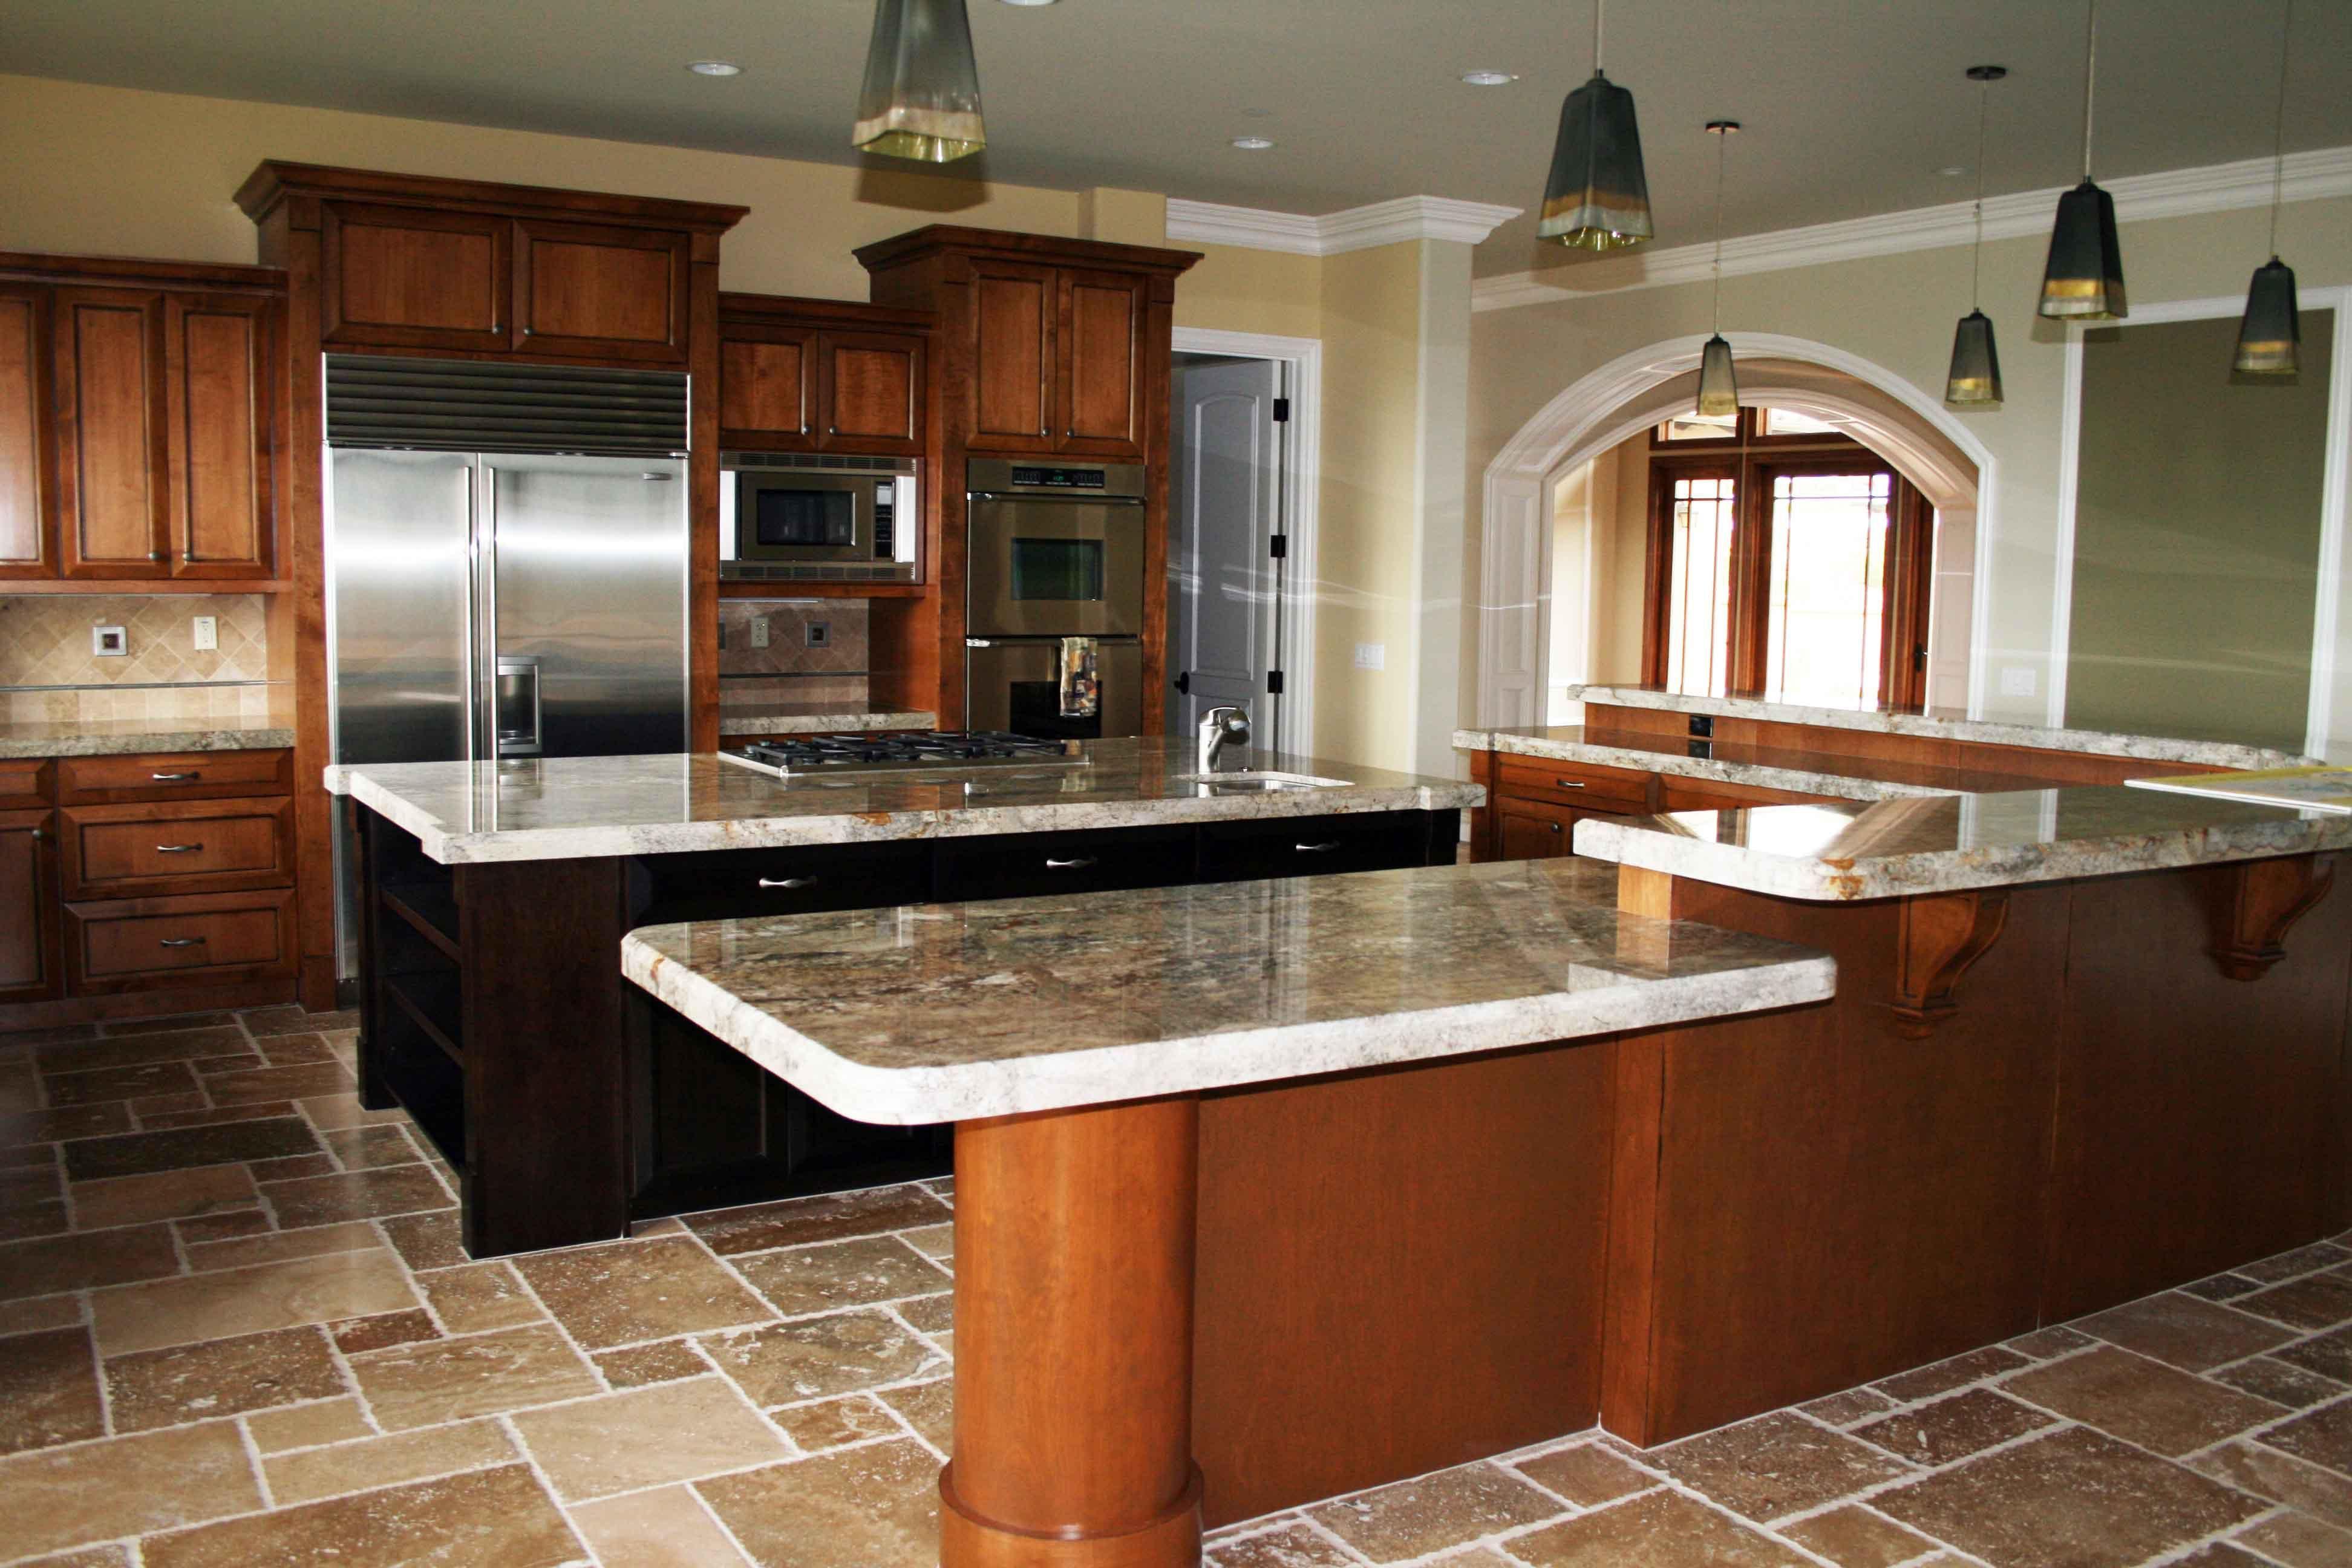 image of rustic kitchen island ideas - Rustic Kitchen Island Ideas